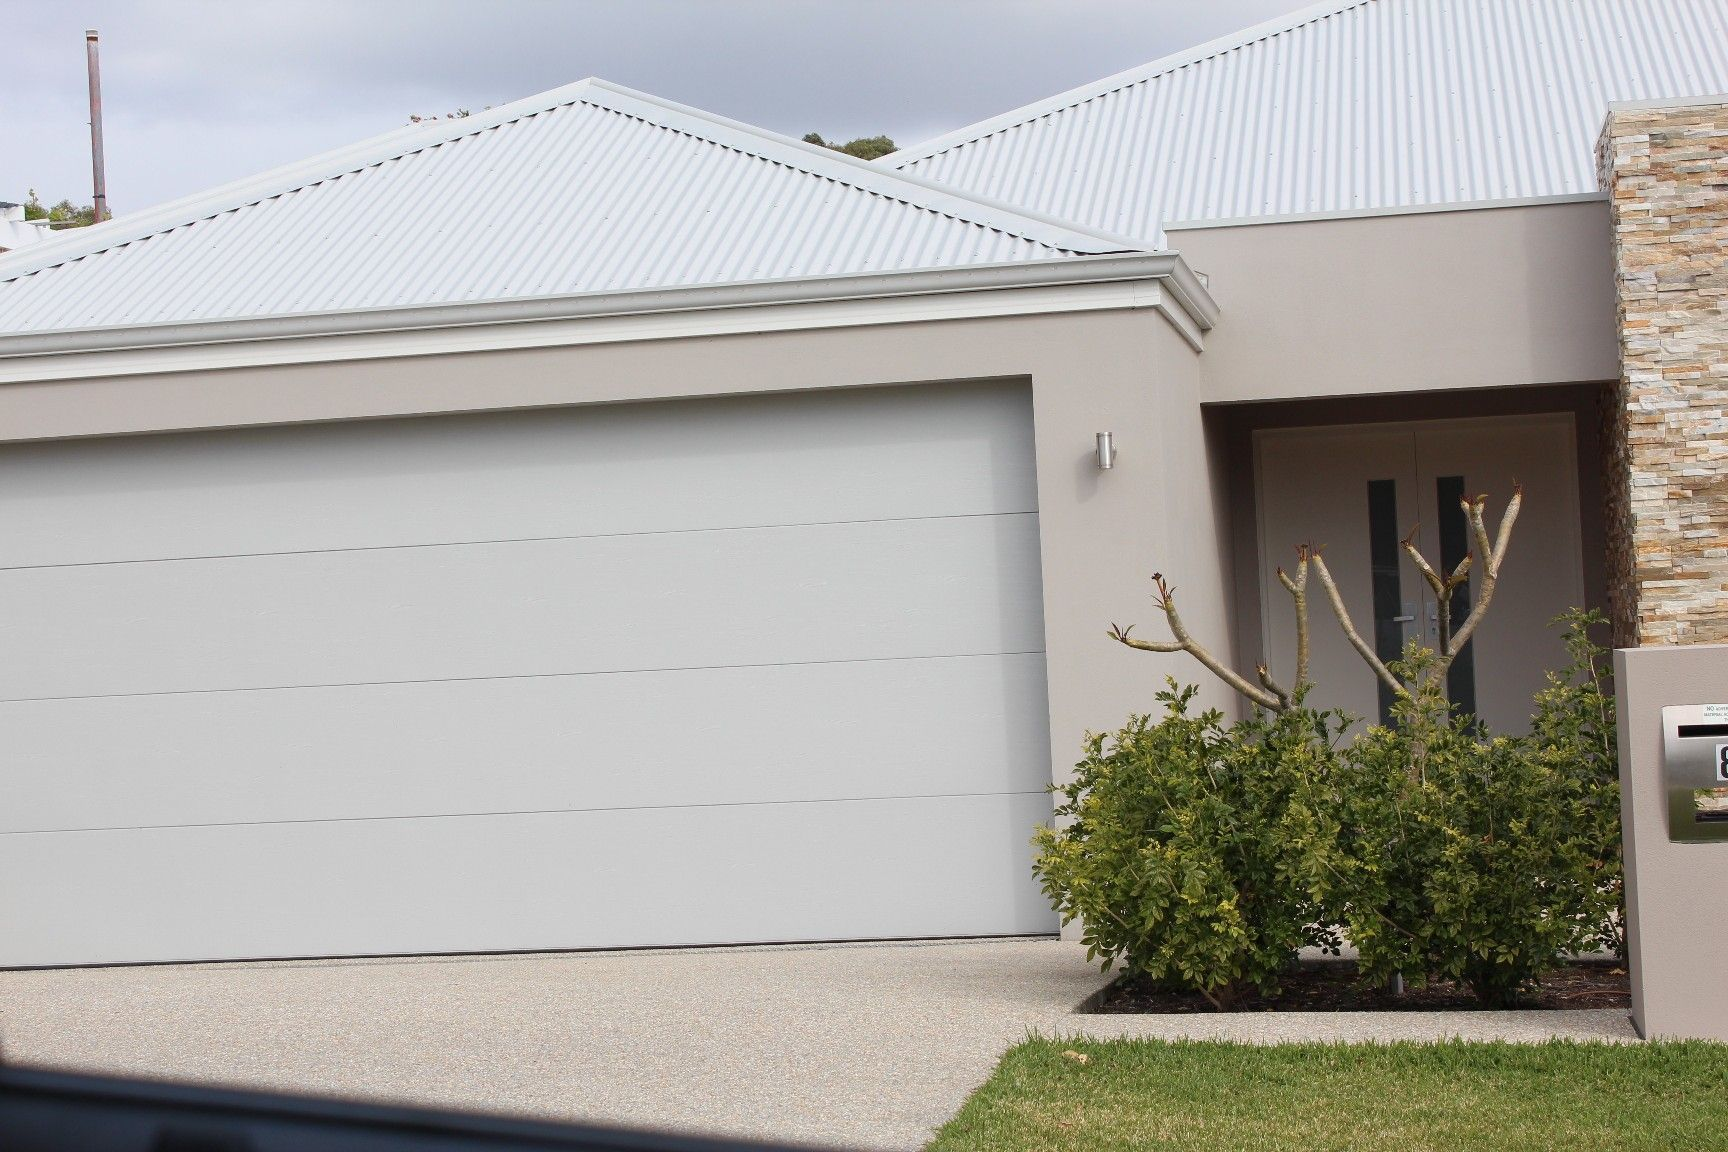 Shale Grey Roof Gutters And Garage Door Surfmist Fascia House Exterior Color Schemes Facade House Exterior House Colors